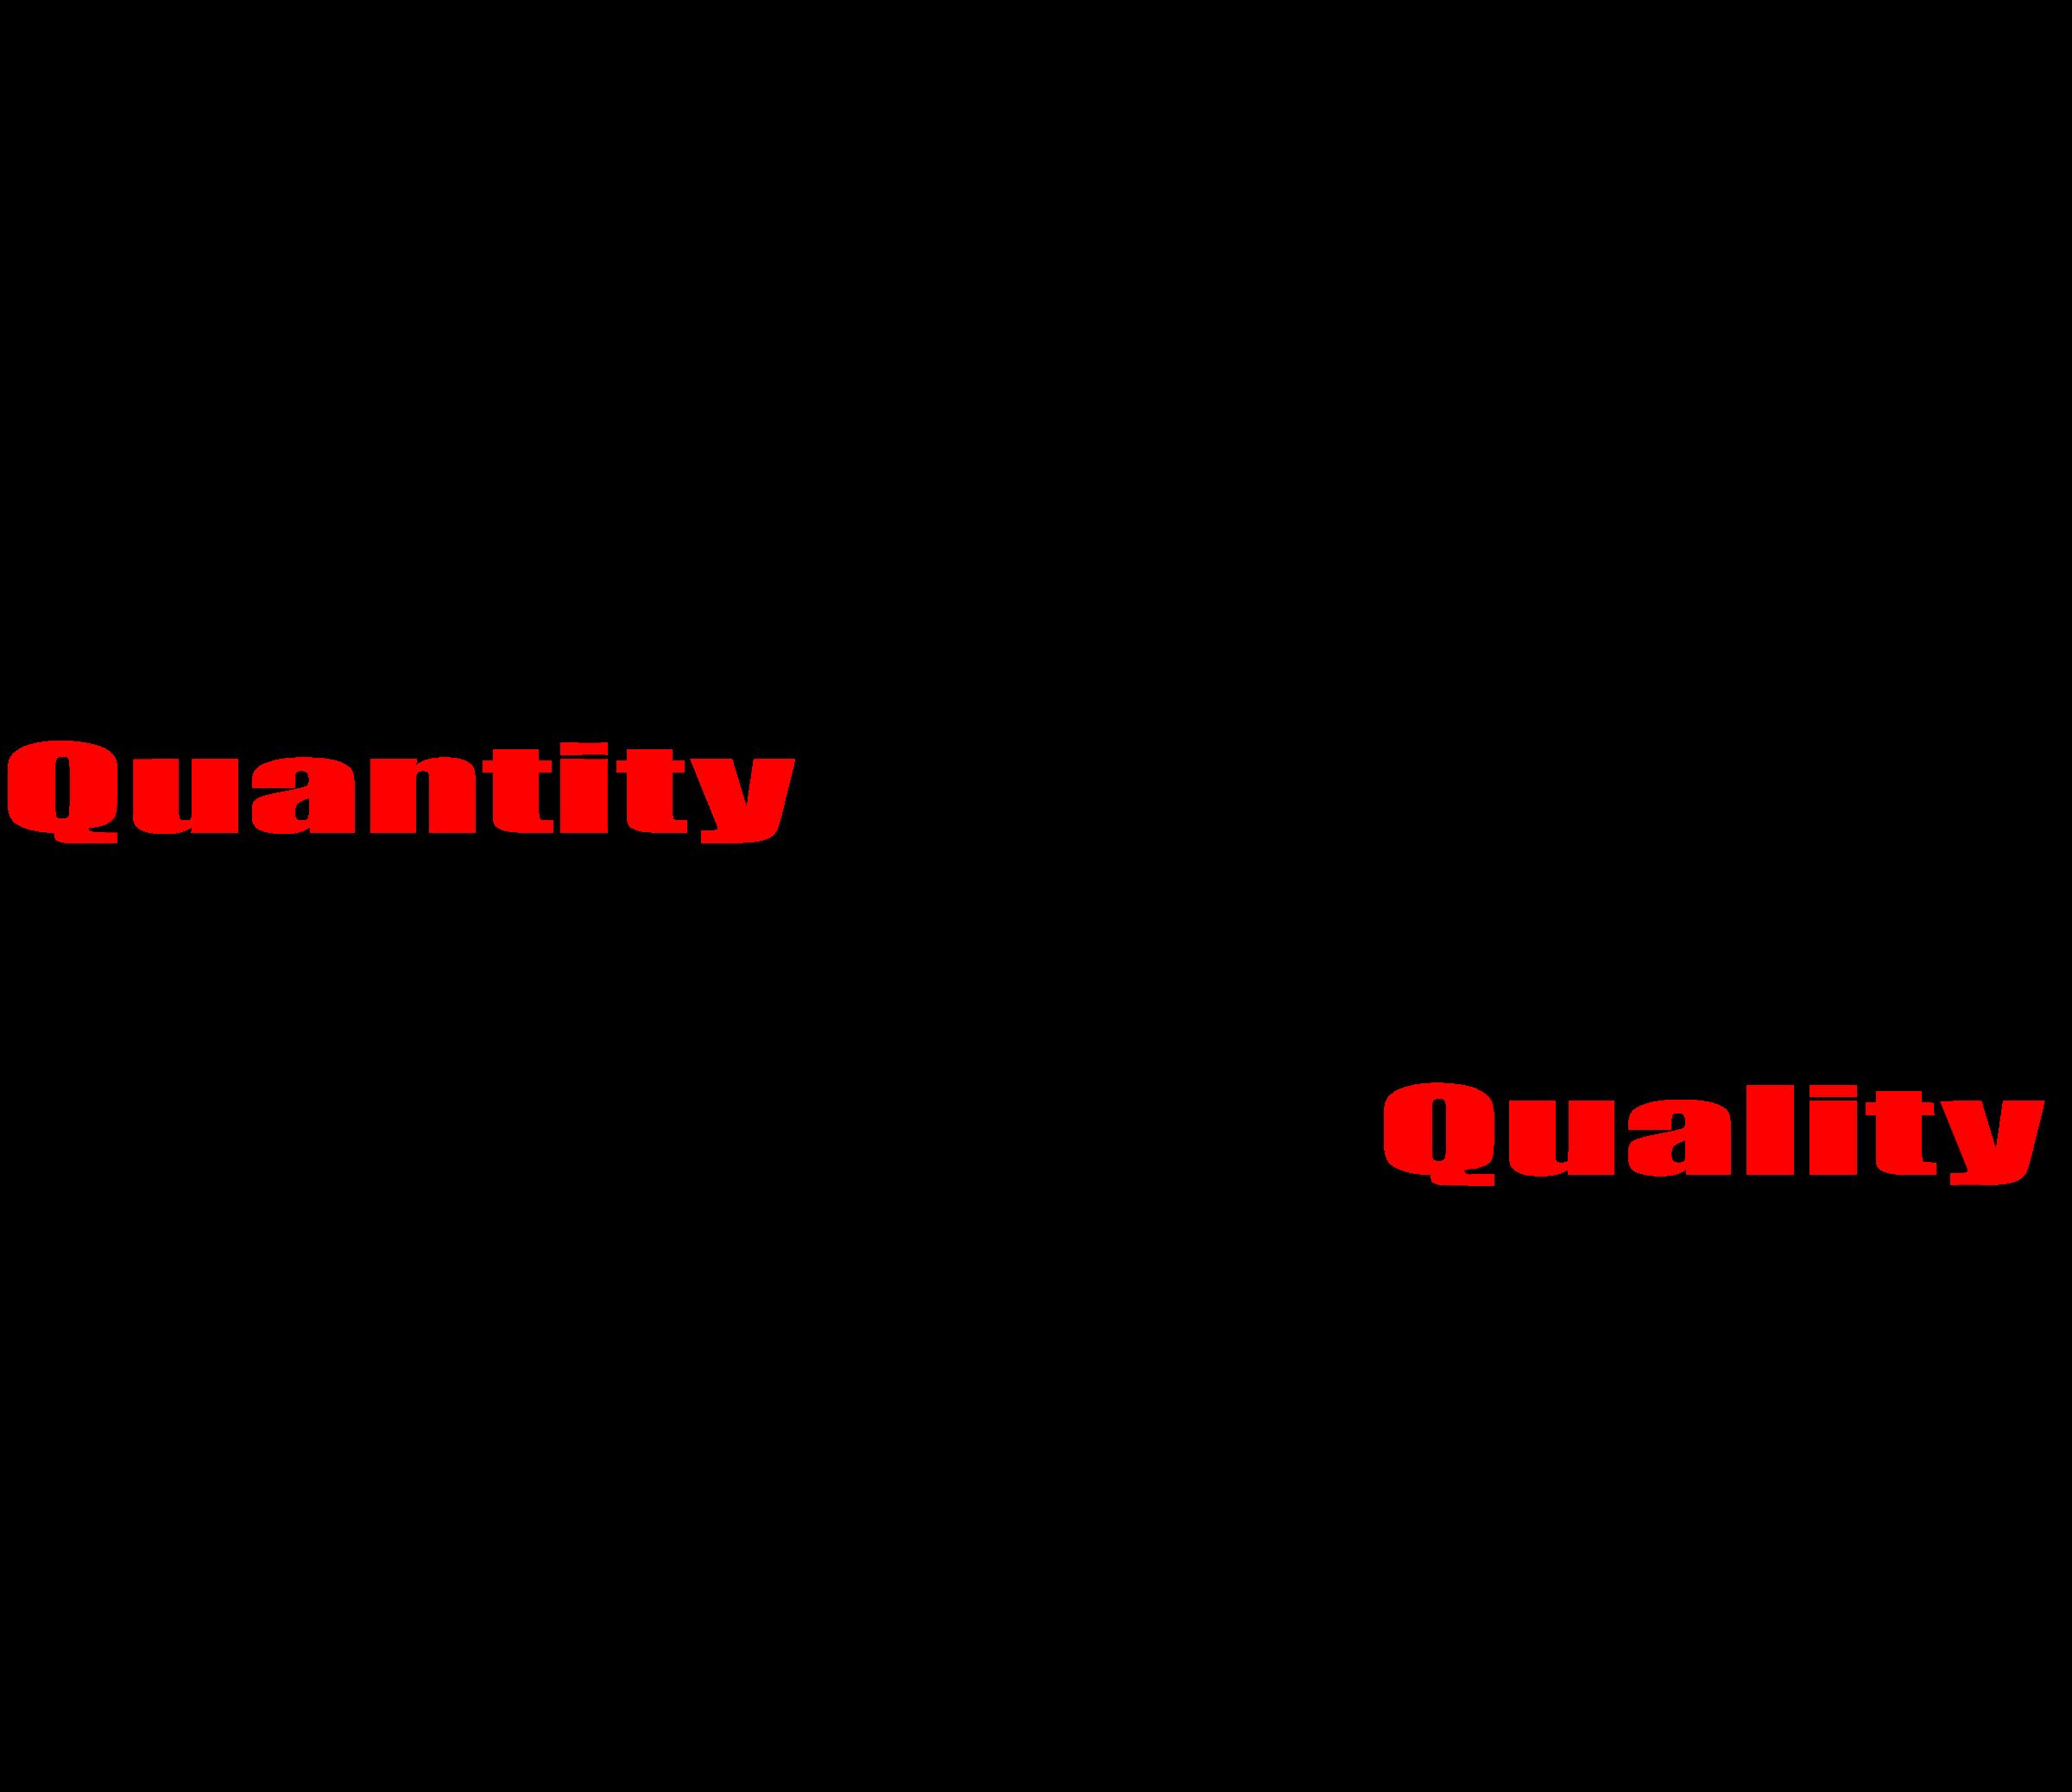 Court clipart government. Quality vs quantity big